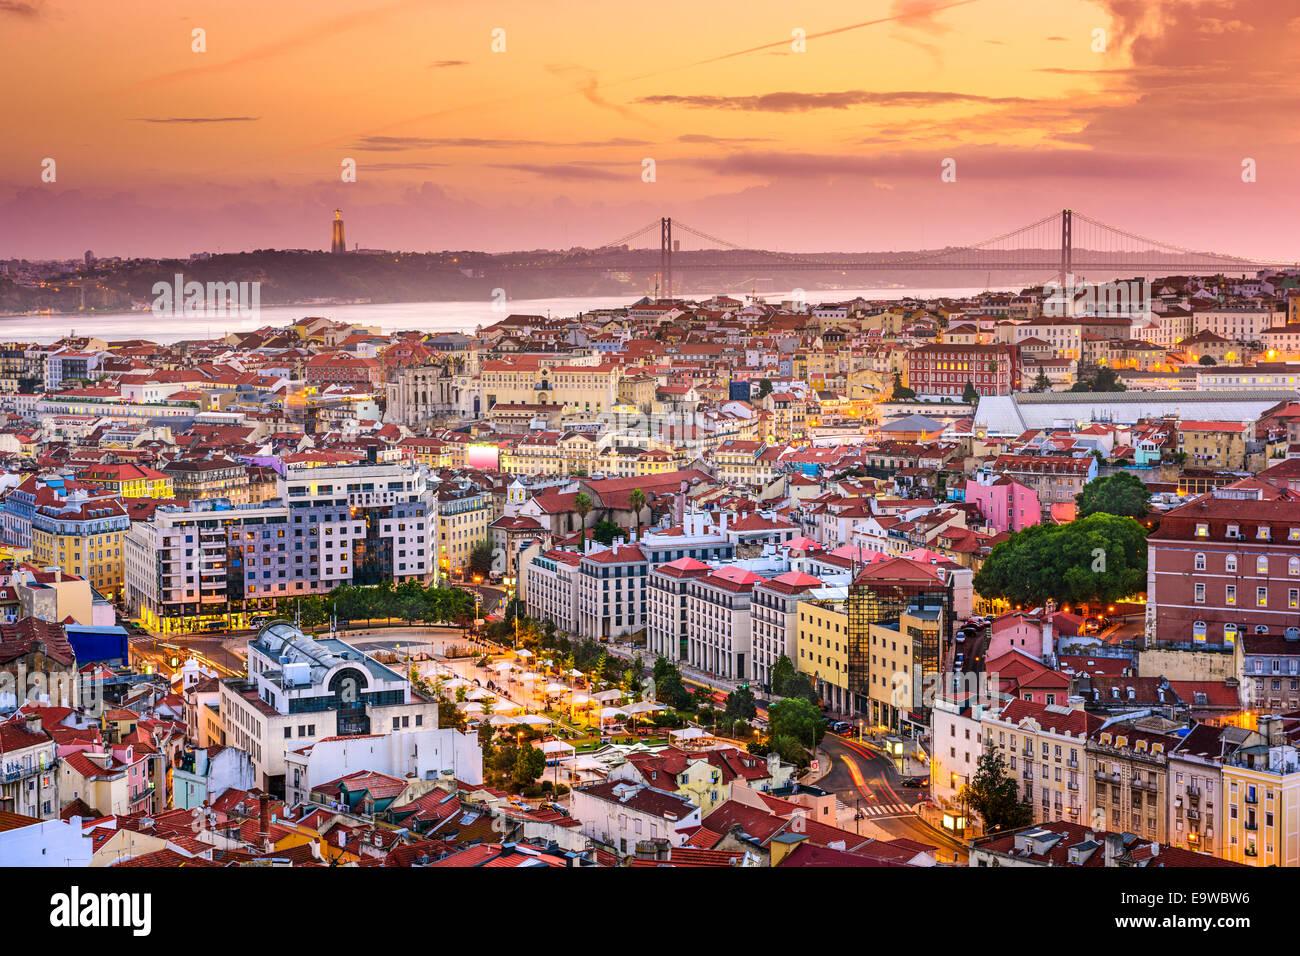 Lisbonne, Portugal skyline at night. Photo Stock